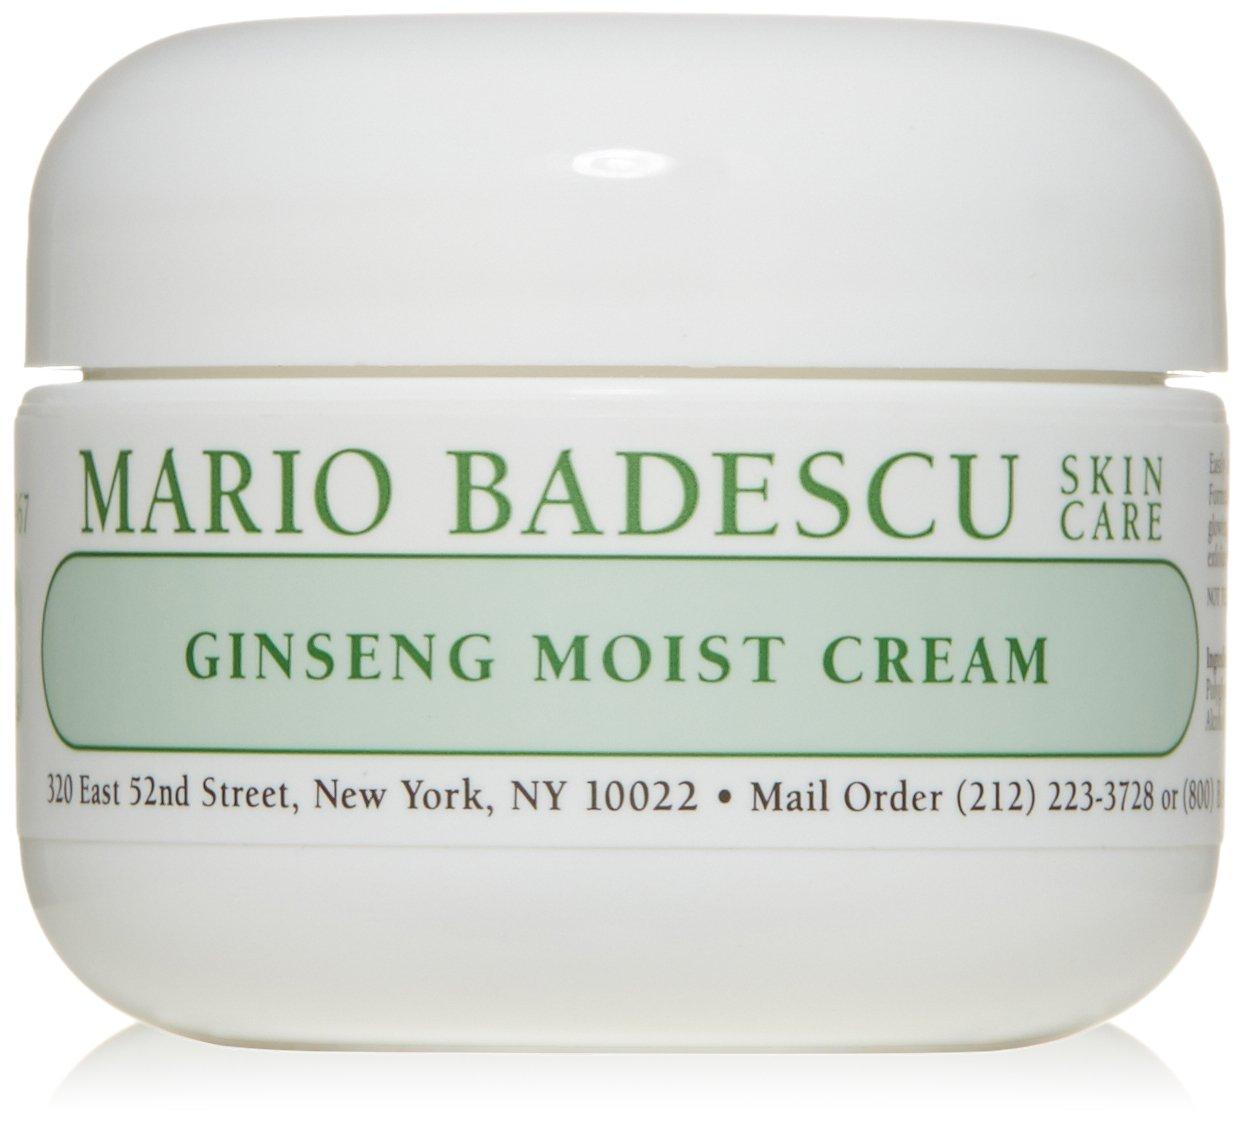 Mario Badescu Ginseng Moist Cream For Combination Dry Sensitive Skin Types 29ml 1oz